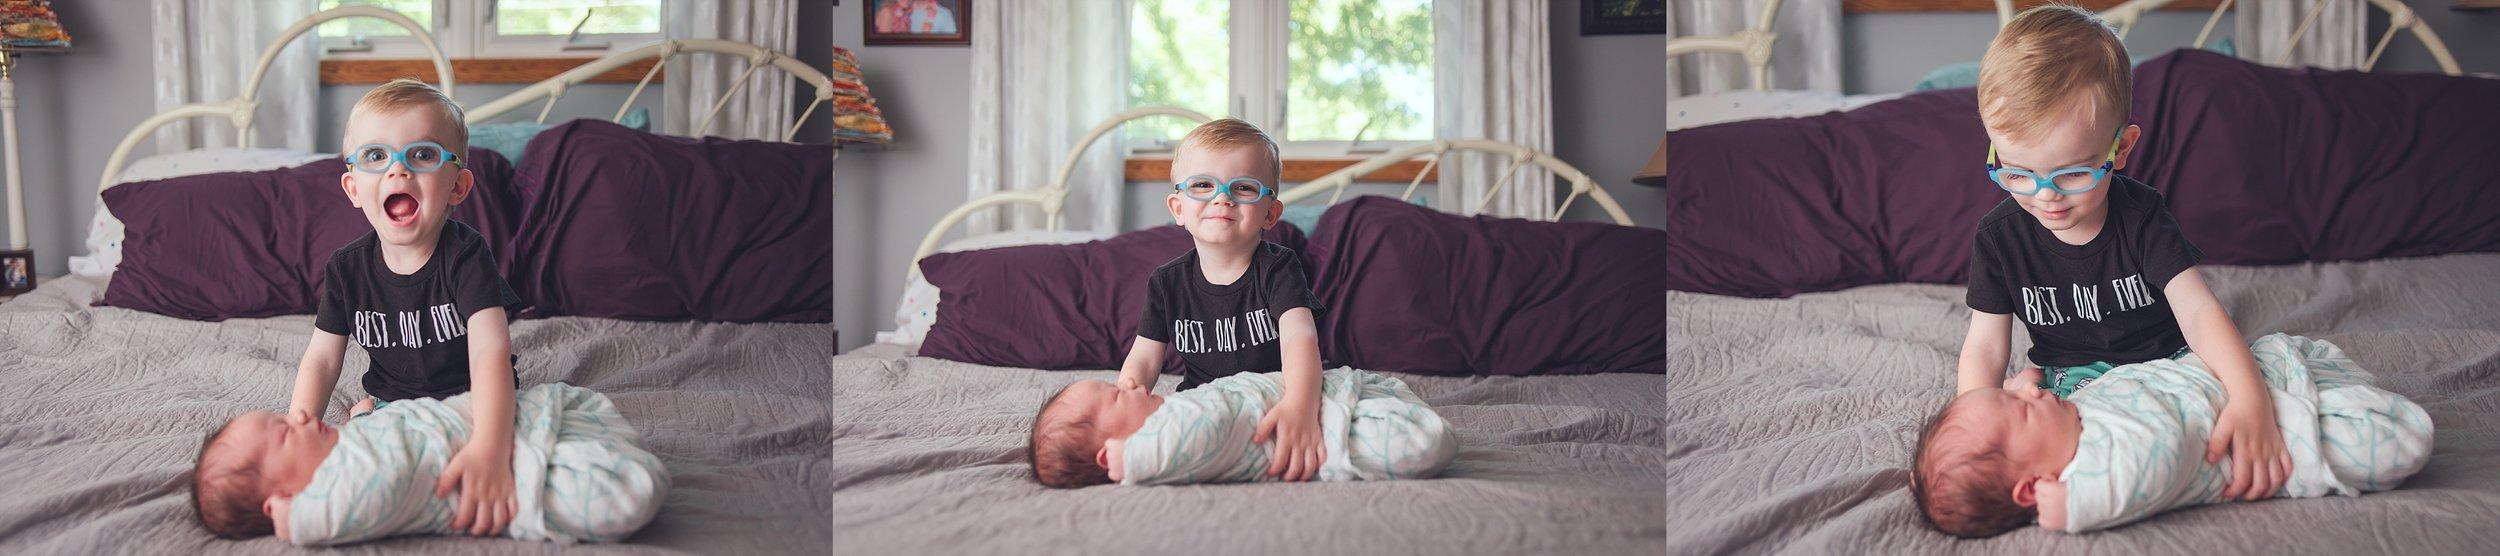 BrittneyHogue-NewbornPhotographer-FamilyPhotographer-PeoriaIL-PekinIL-MortonIL (6).jpg